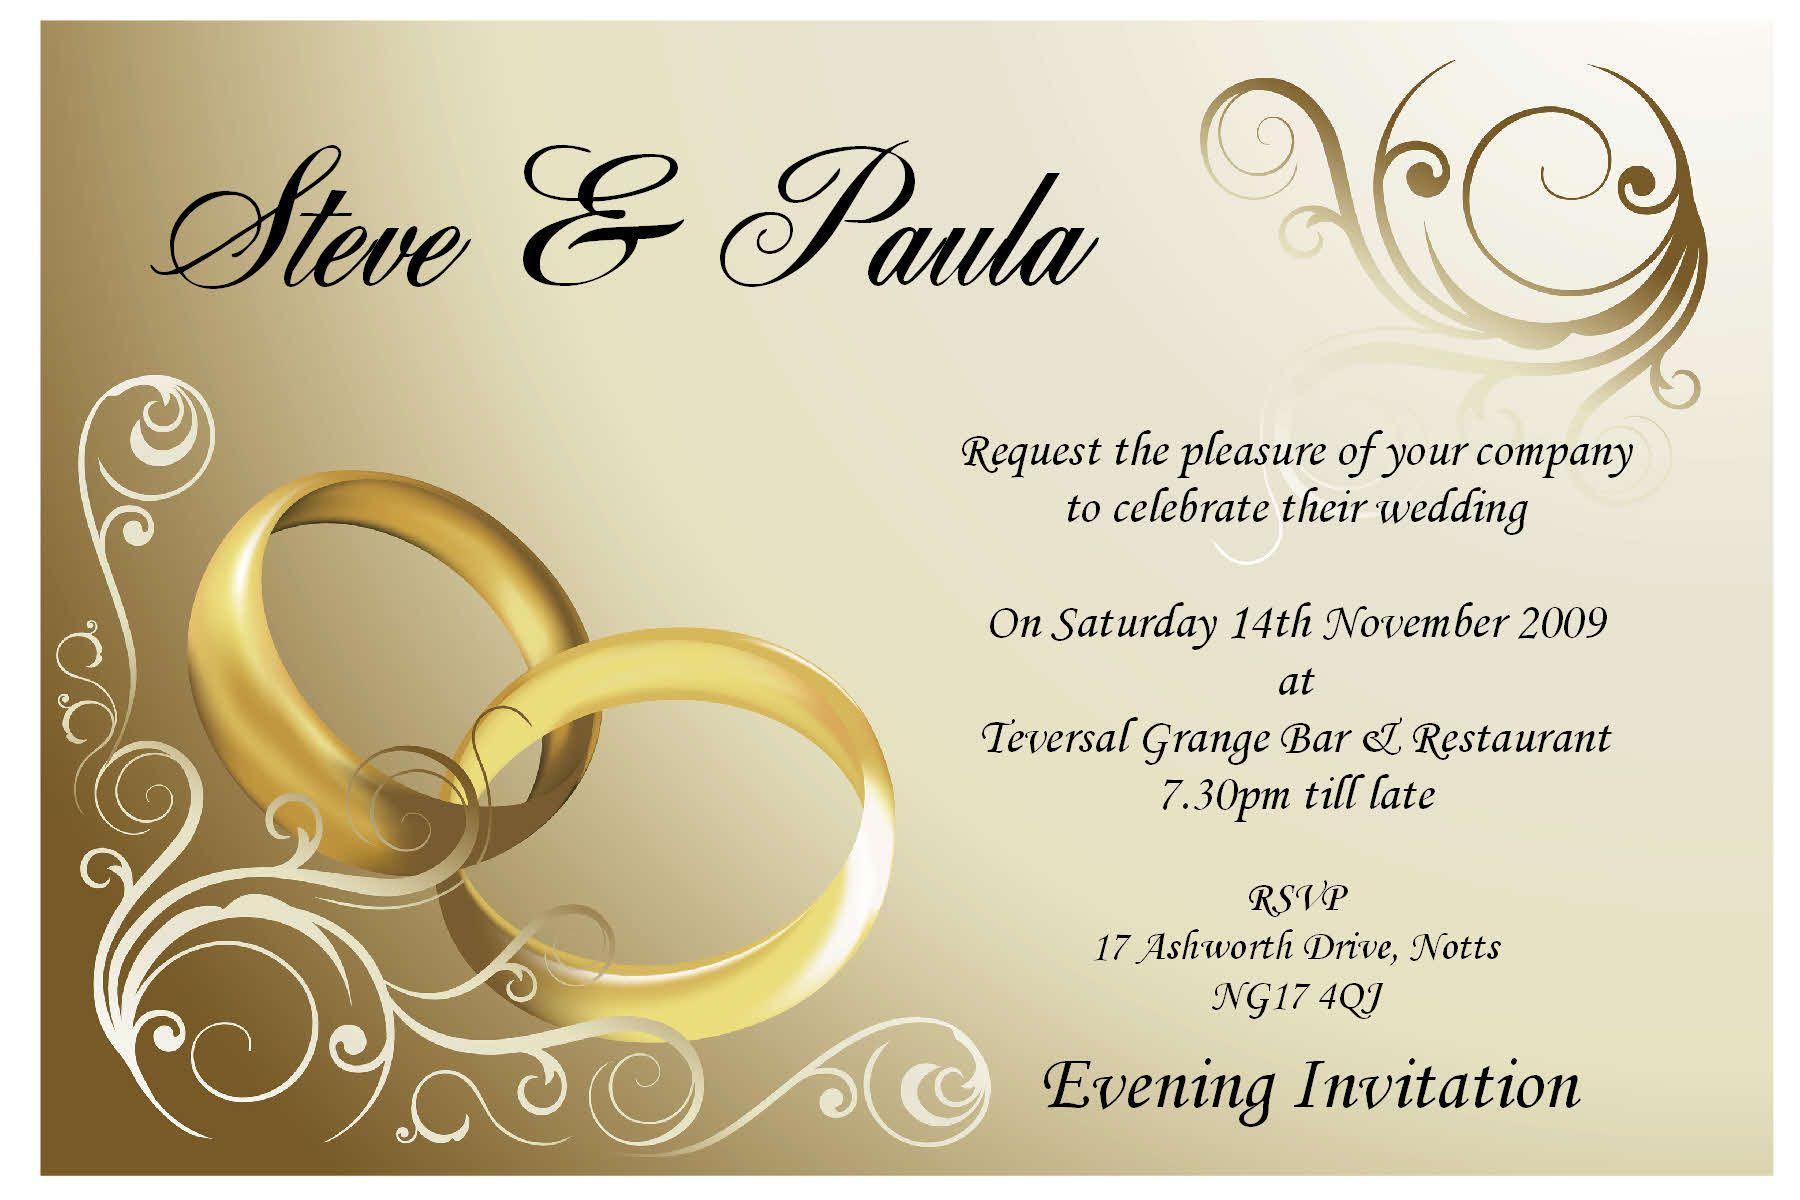 wedding invitation card design online free - Invite Card Ideas | Engagement  invitation cards, Wedding invitation card template, Marriage invitation card